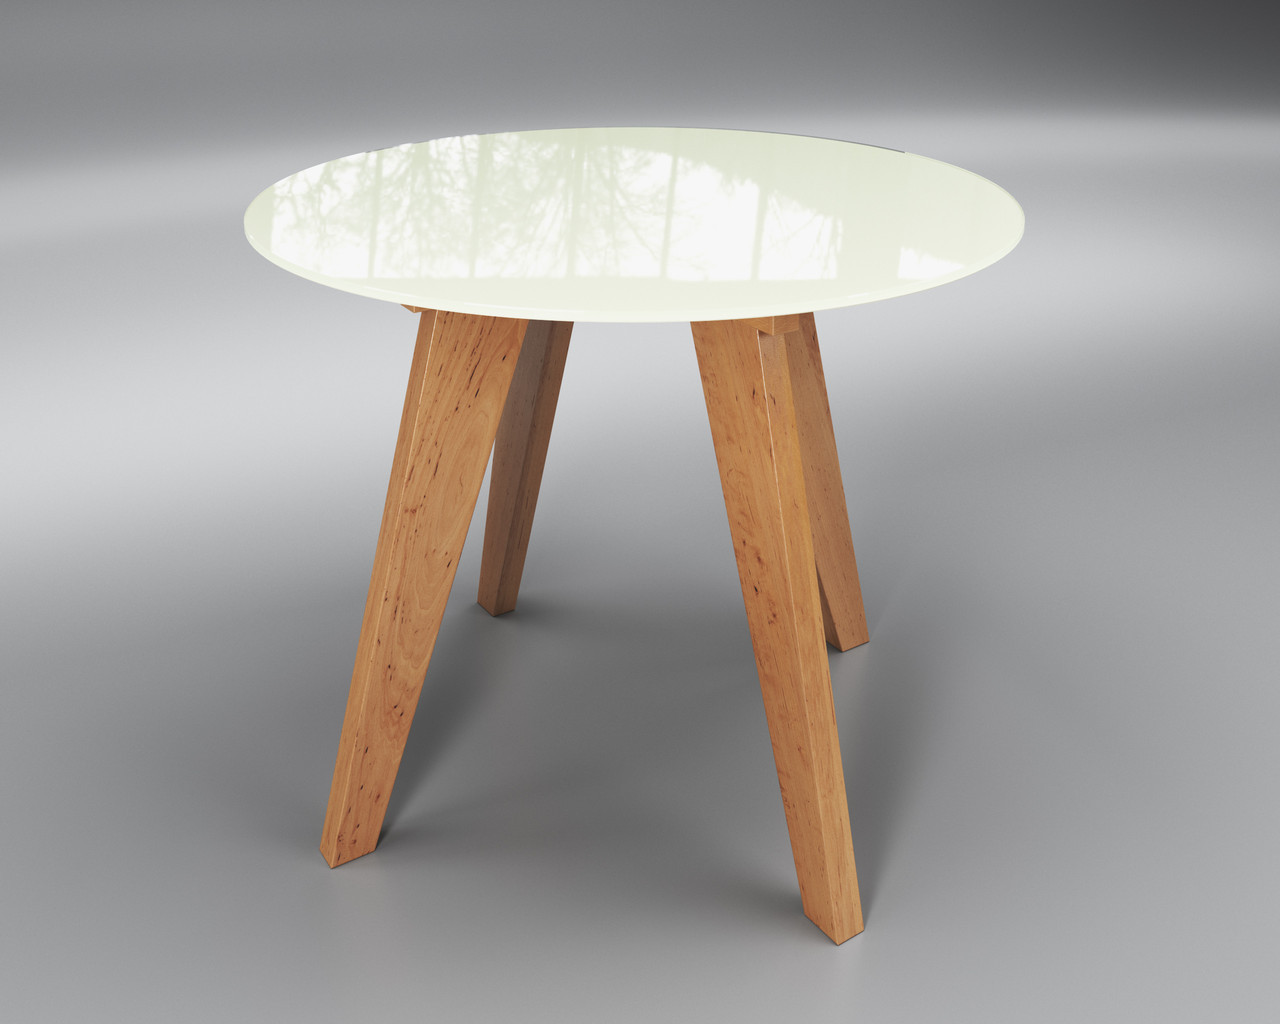 Стол стеклянный Леонардо Круг белый / ольха (диаметр - 0,90 м.)